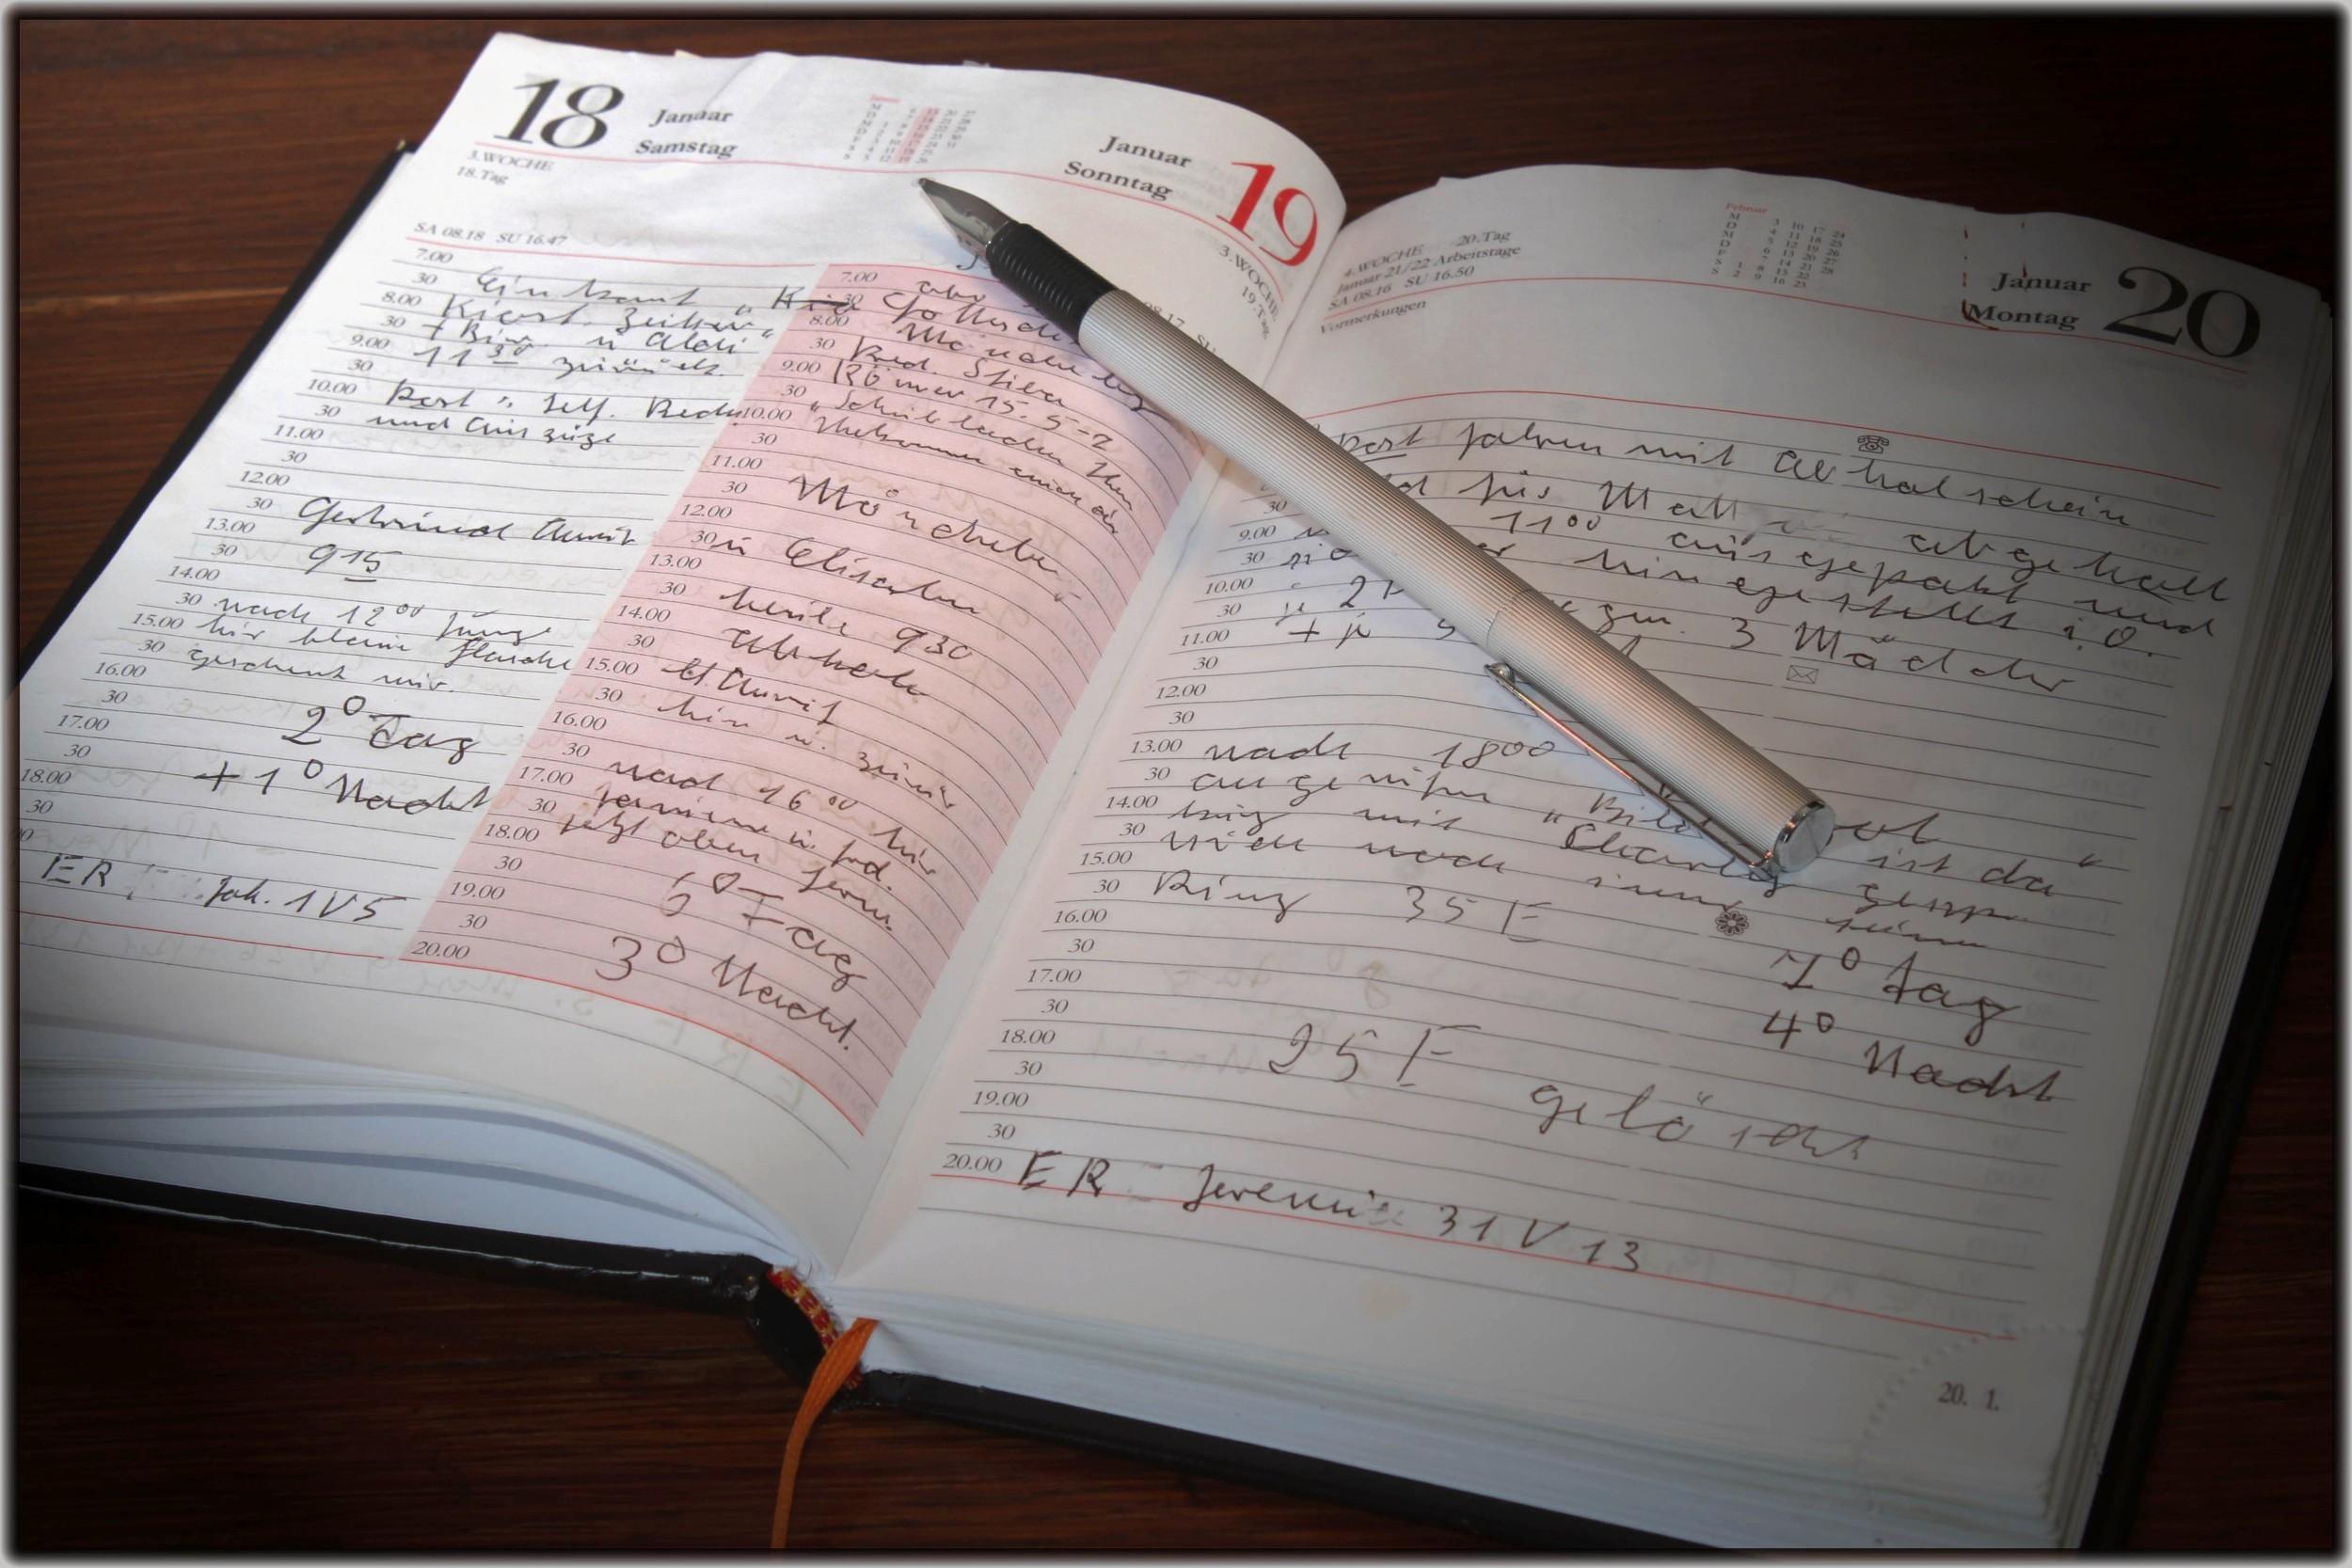 Voller Terminkalender